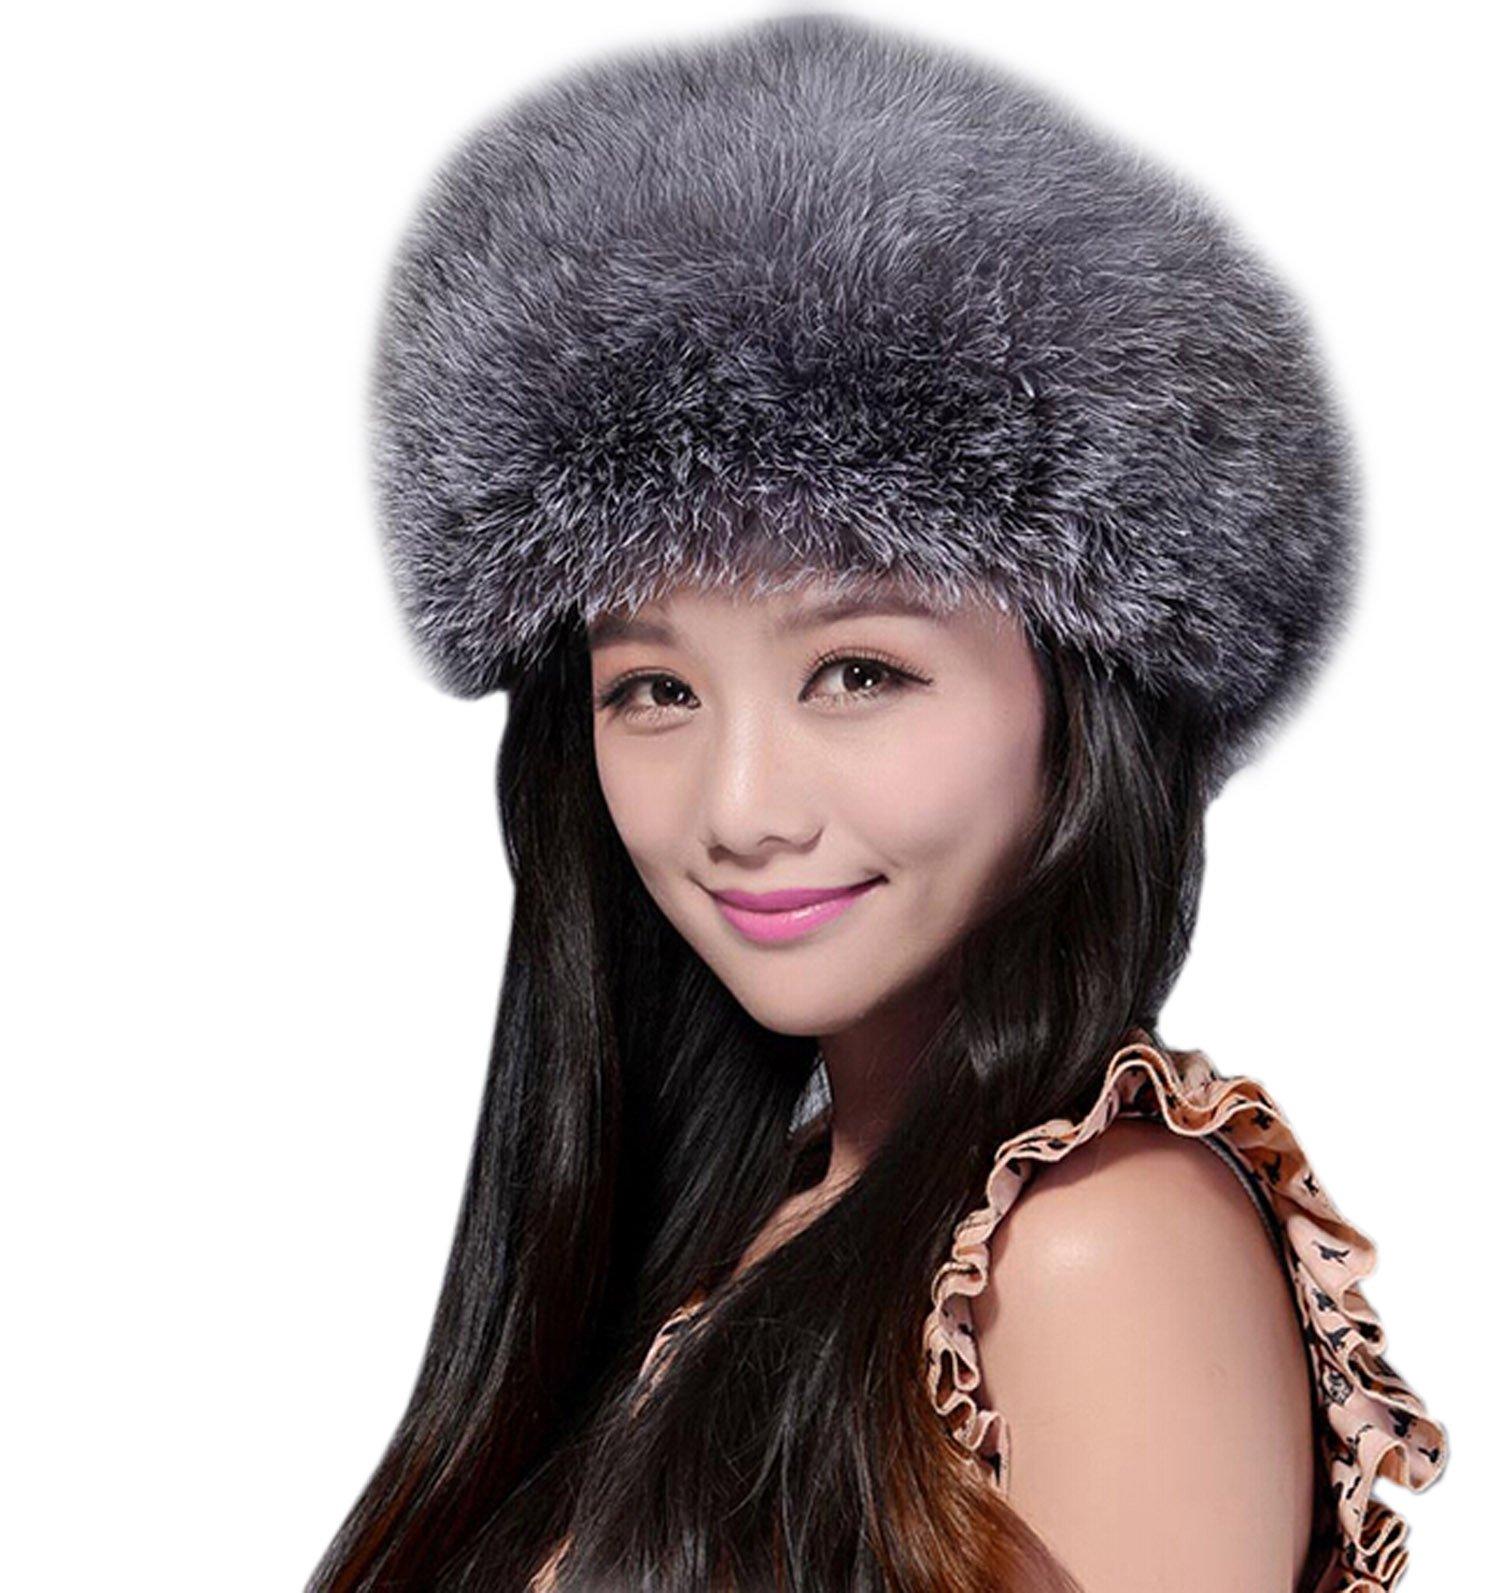 Easting Women's Fox Fur Siberian Mongolian Ushanka Trapper Hats (Silver Fox) by Easting&co